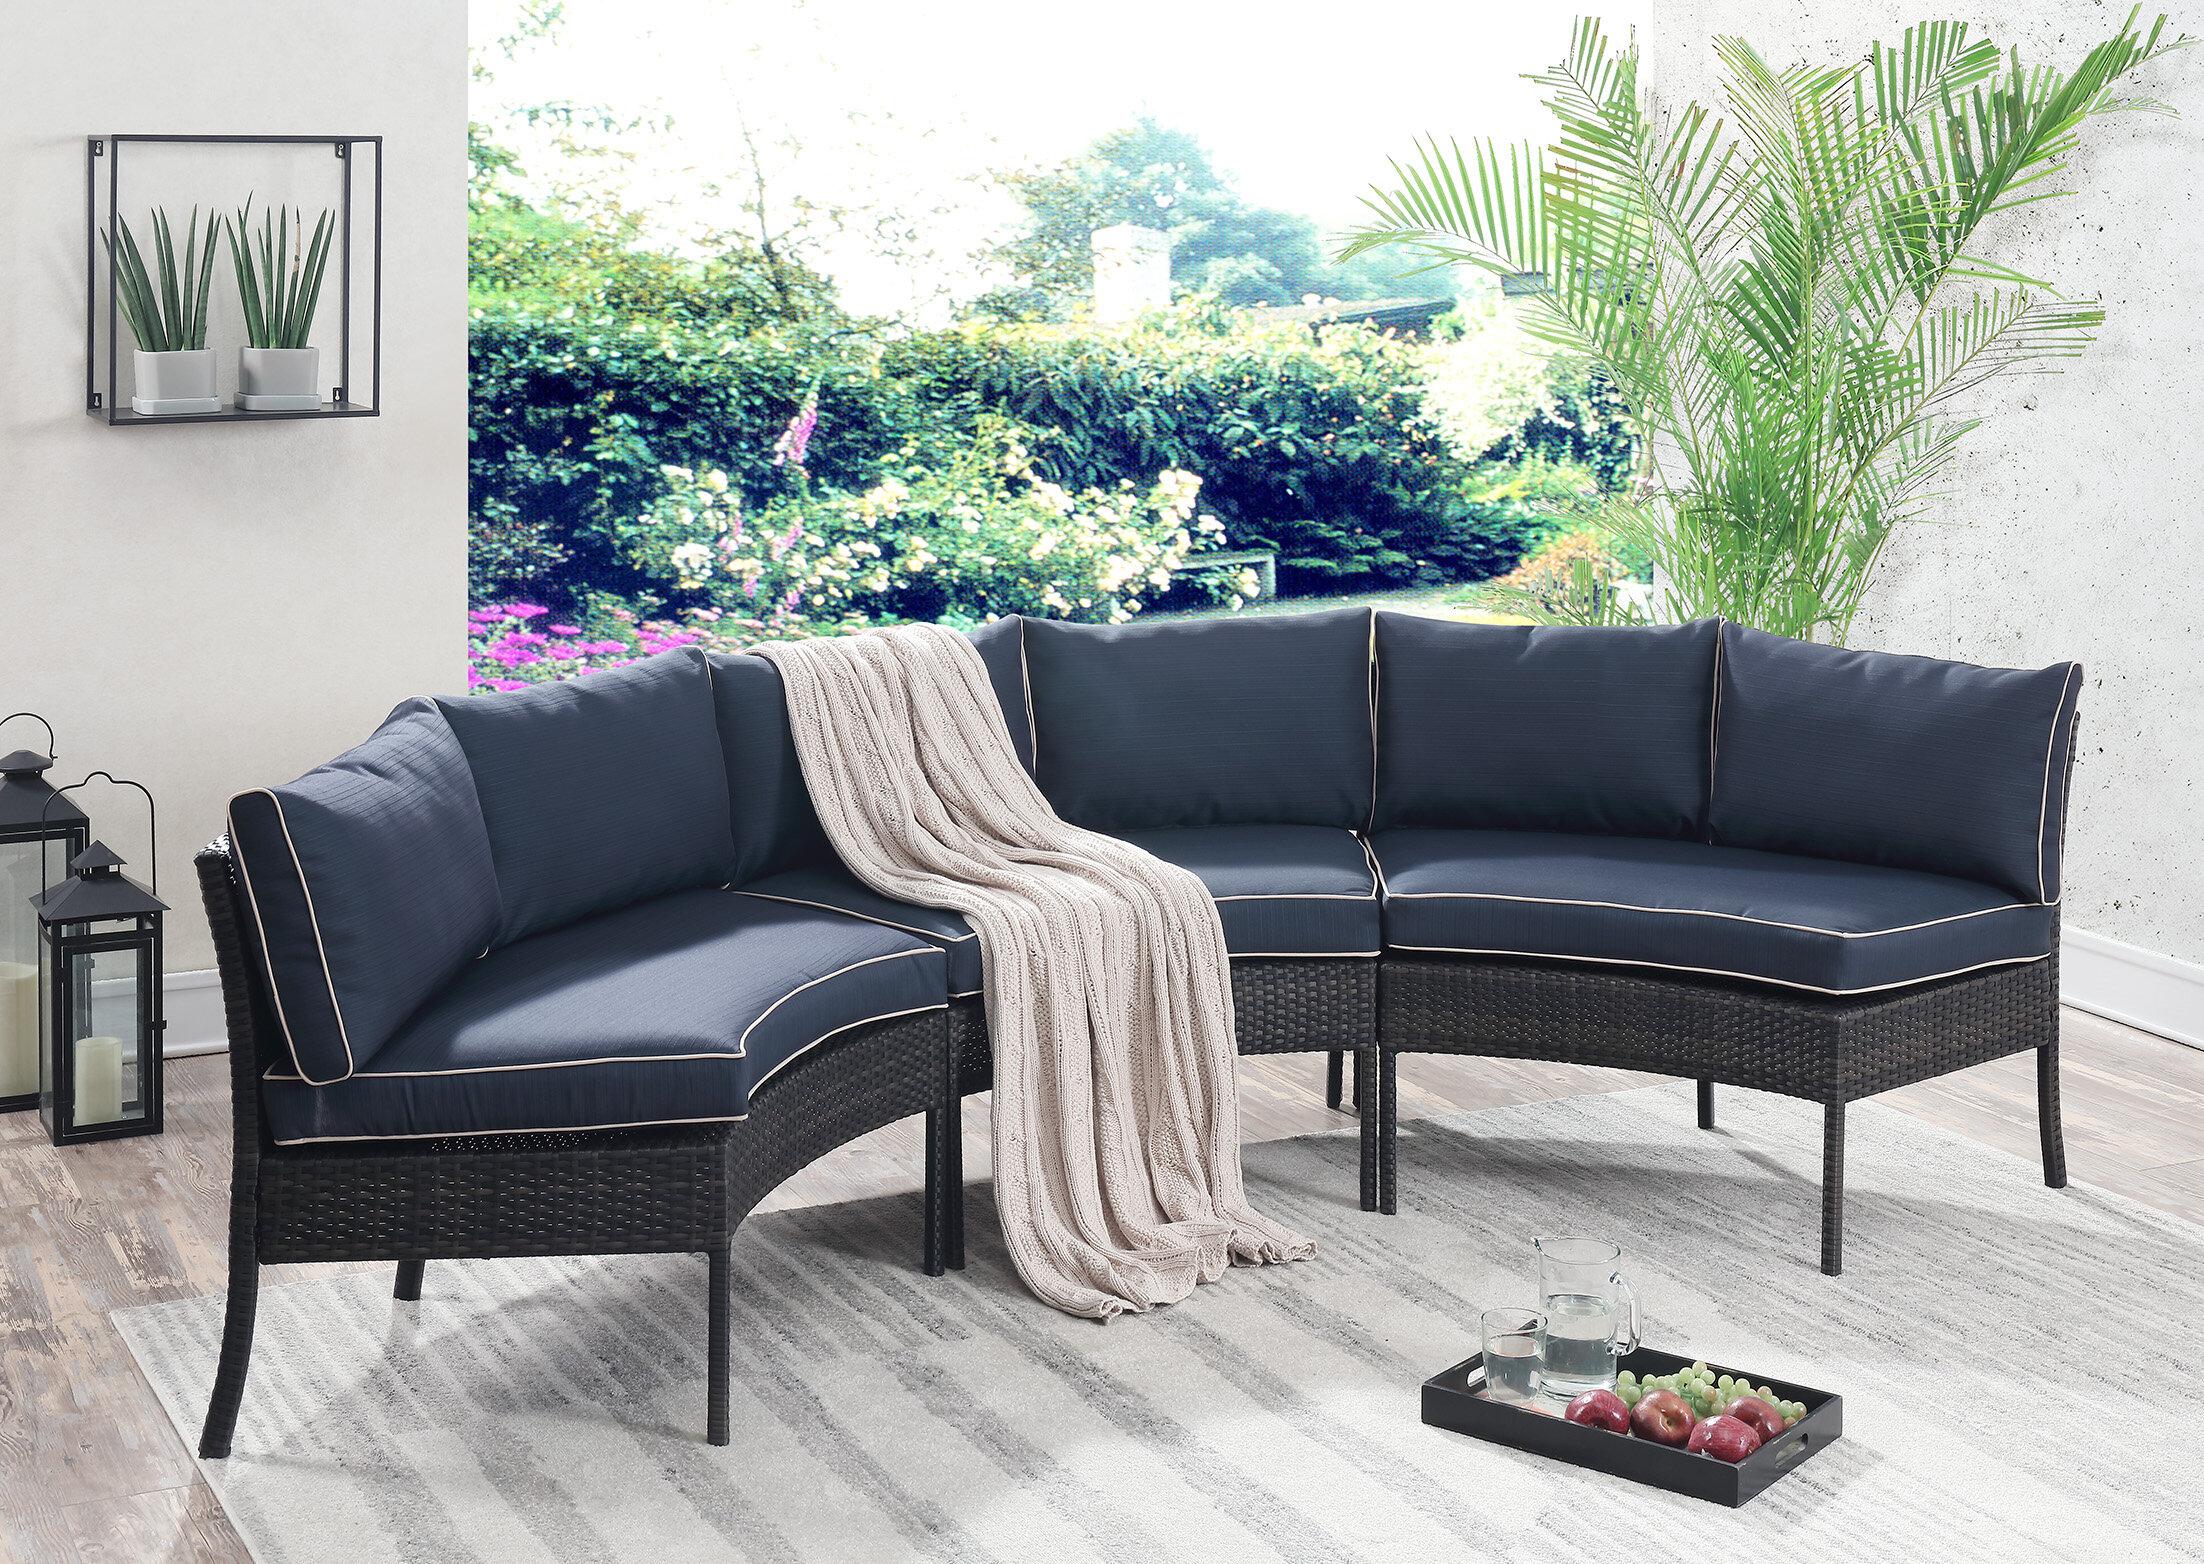 Beau Breakwater Bay Petunia Circular Patio Sectional With Cushions U0026 Reviews |  Wayfair